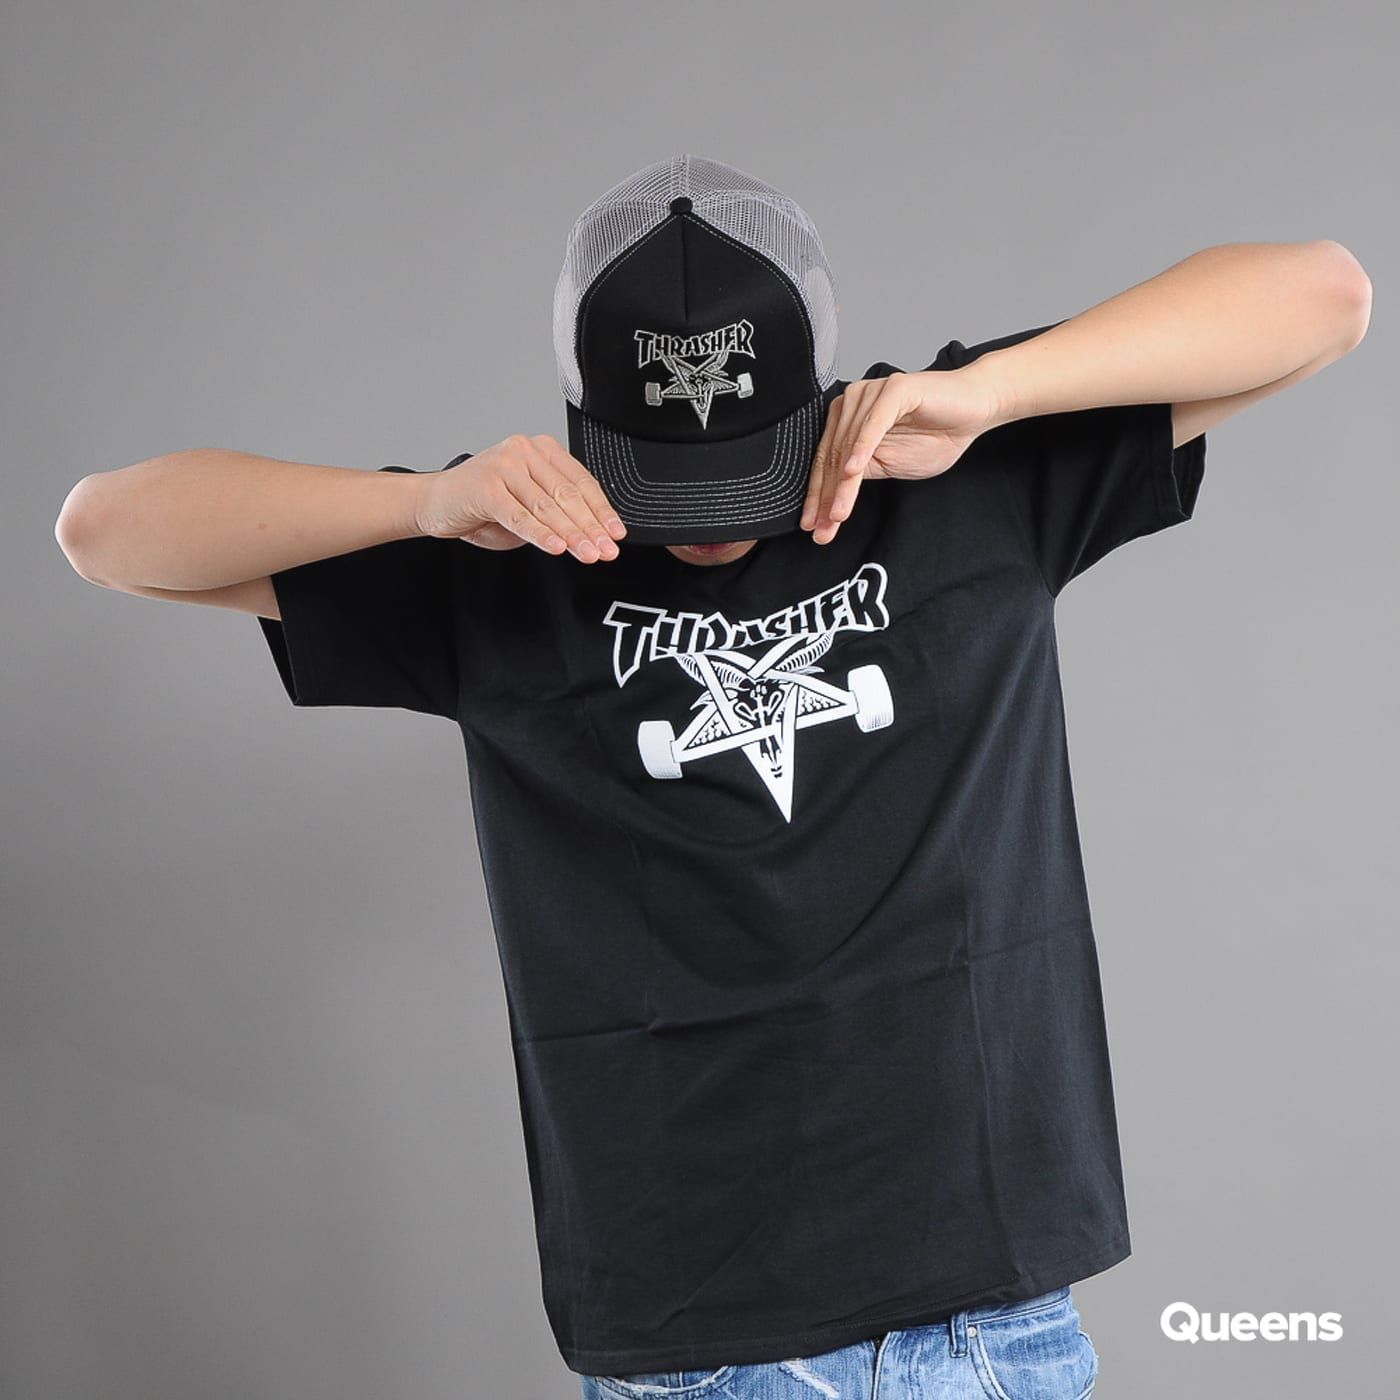 Thrasher Skategoat black